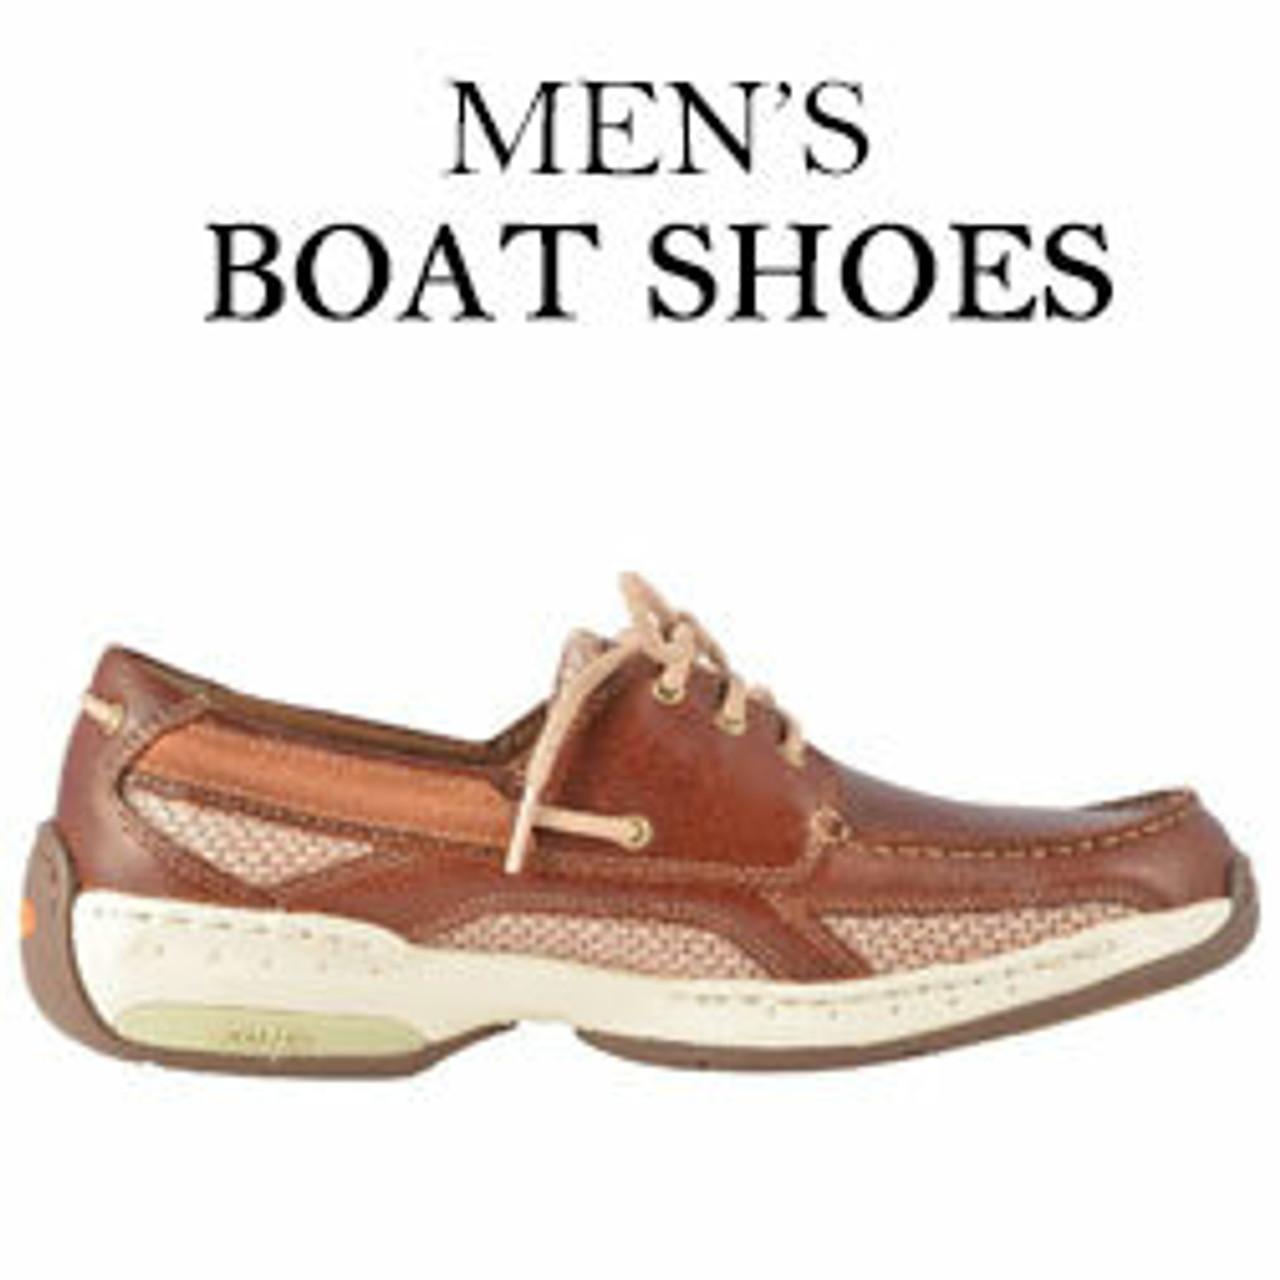 Orthopedic Boat Shoes For Men |  Mens Deck Shoes